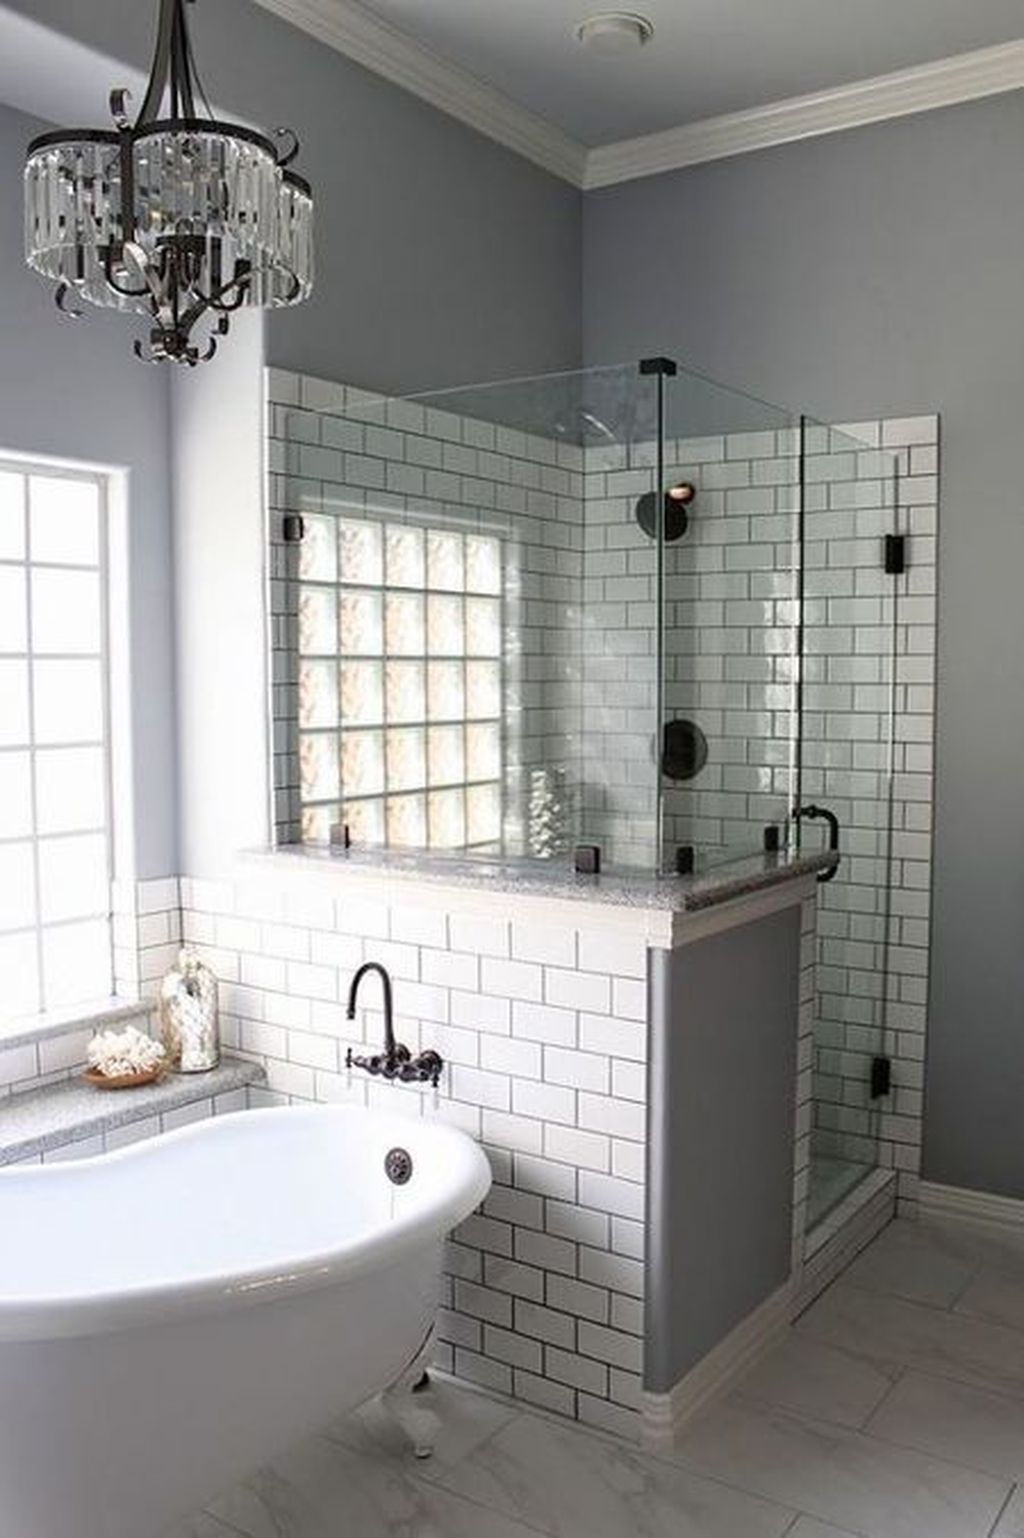 Unusual Bathroom Design Ideas You Need To Know 20